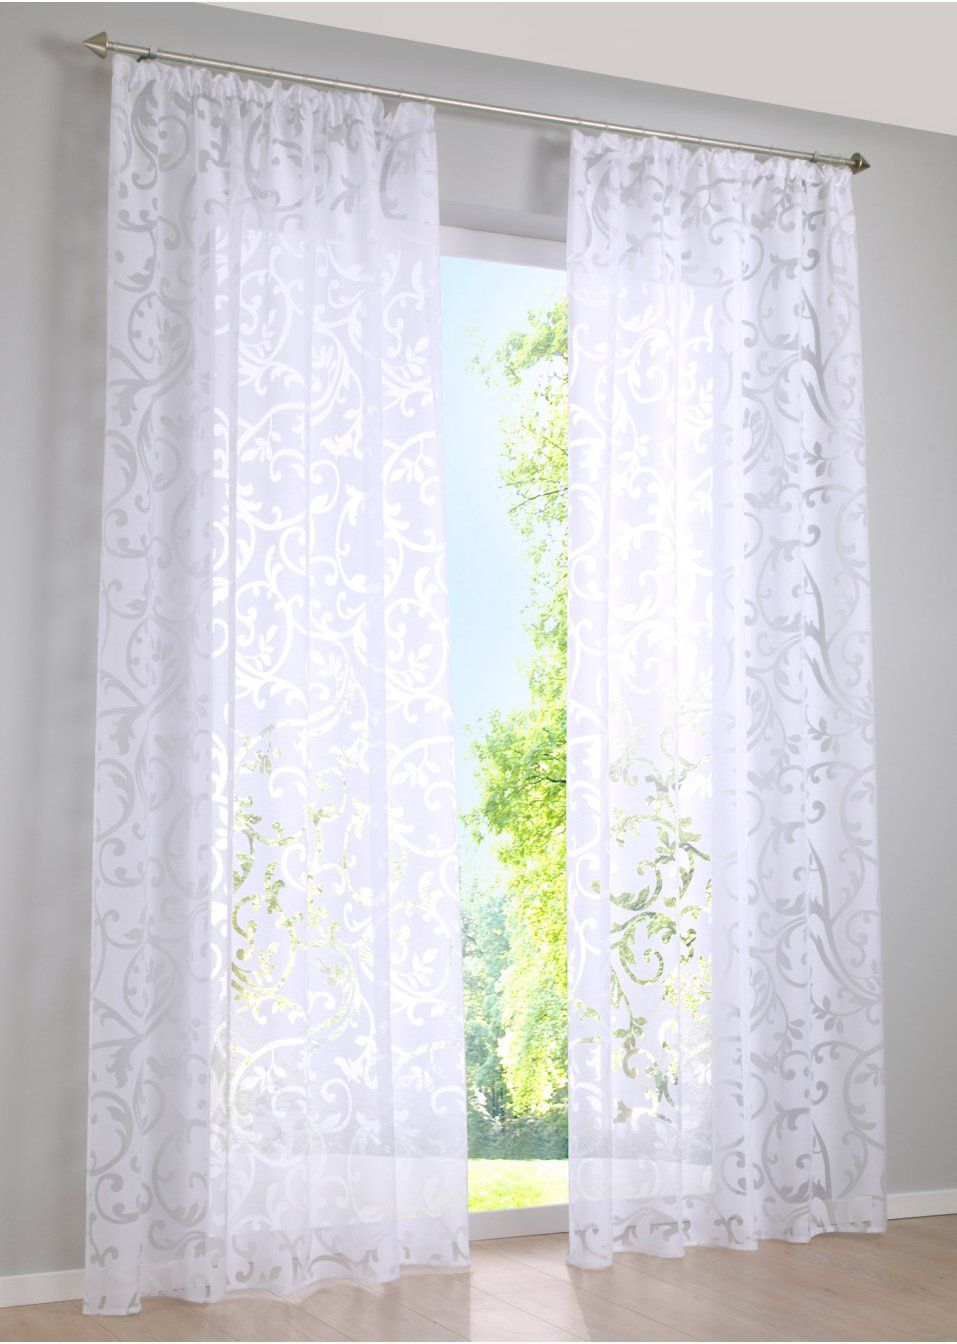 voilage reno 1 pce voilages tringle et rail. Black Bedroom Furniture Sets. Home Design Ideas